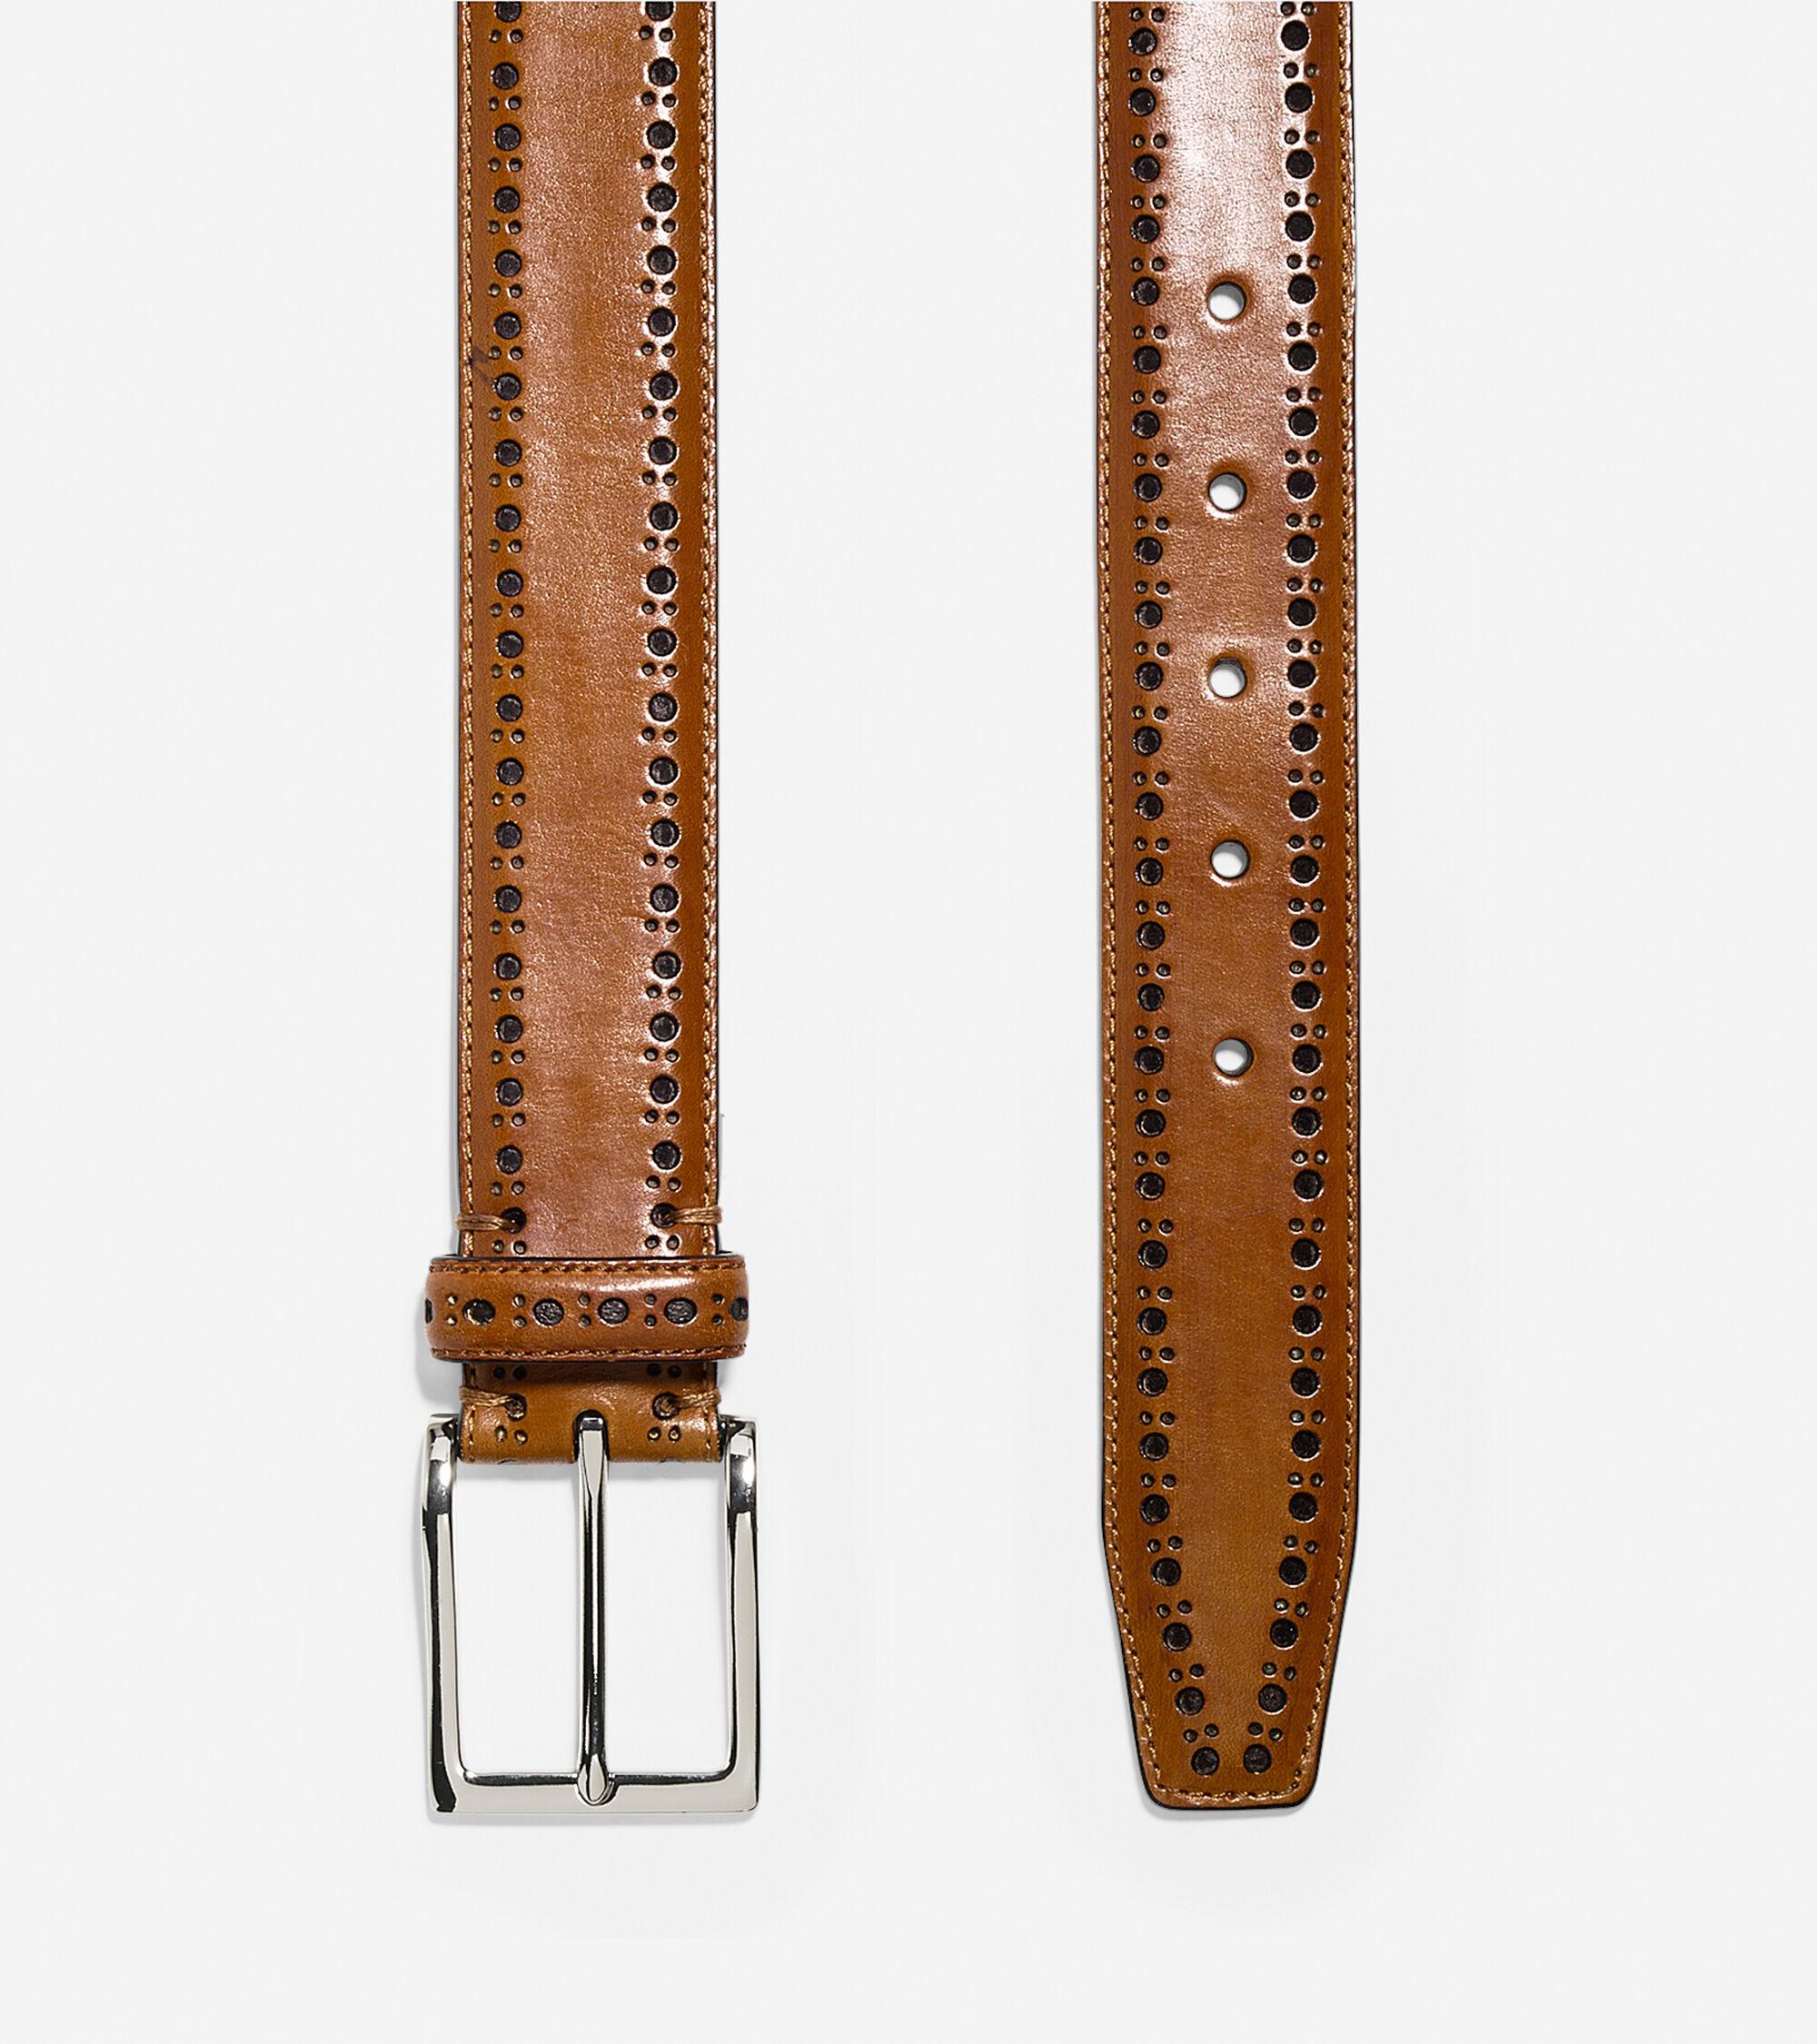 35mm Bridal Leather Belt Colehaan